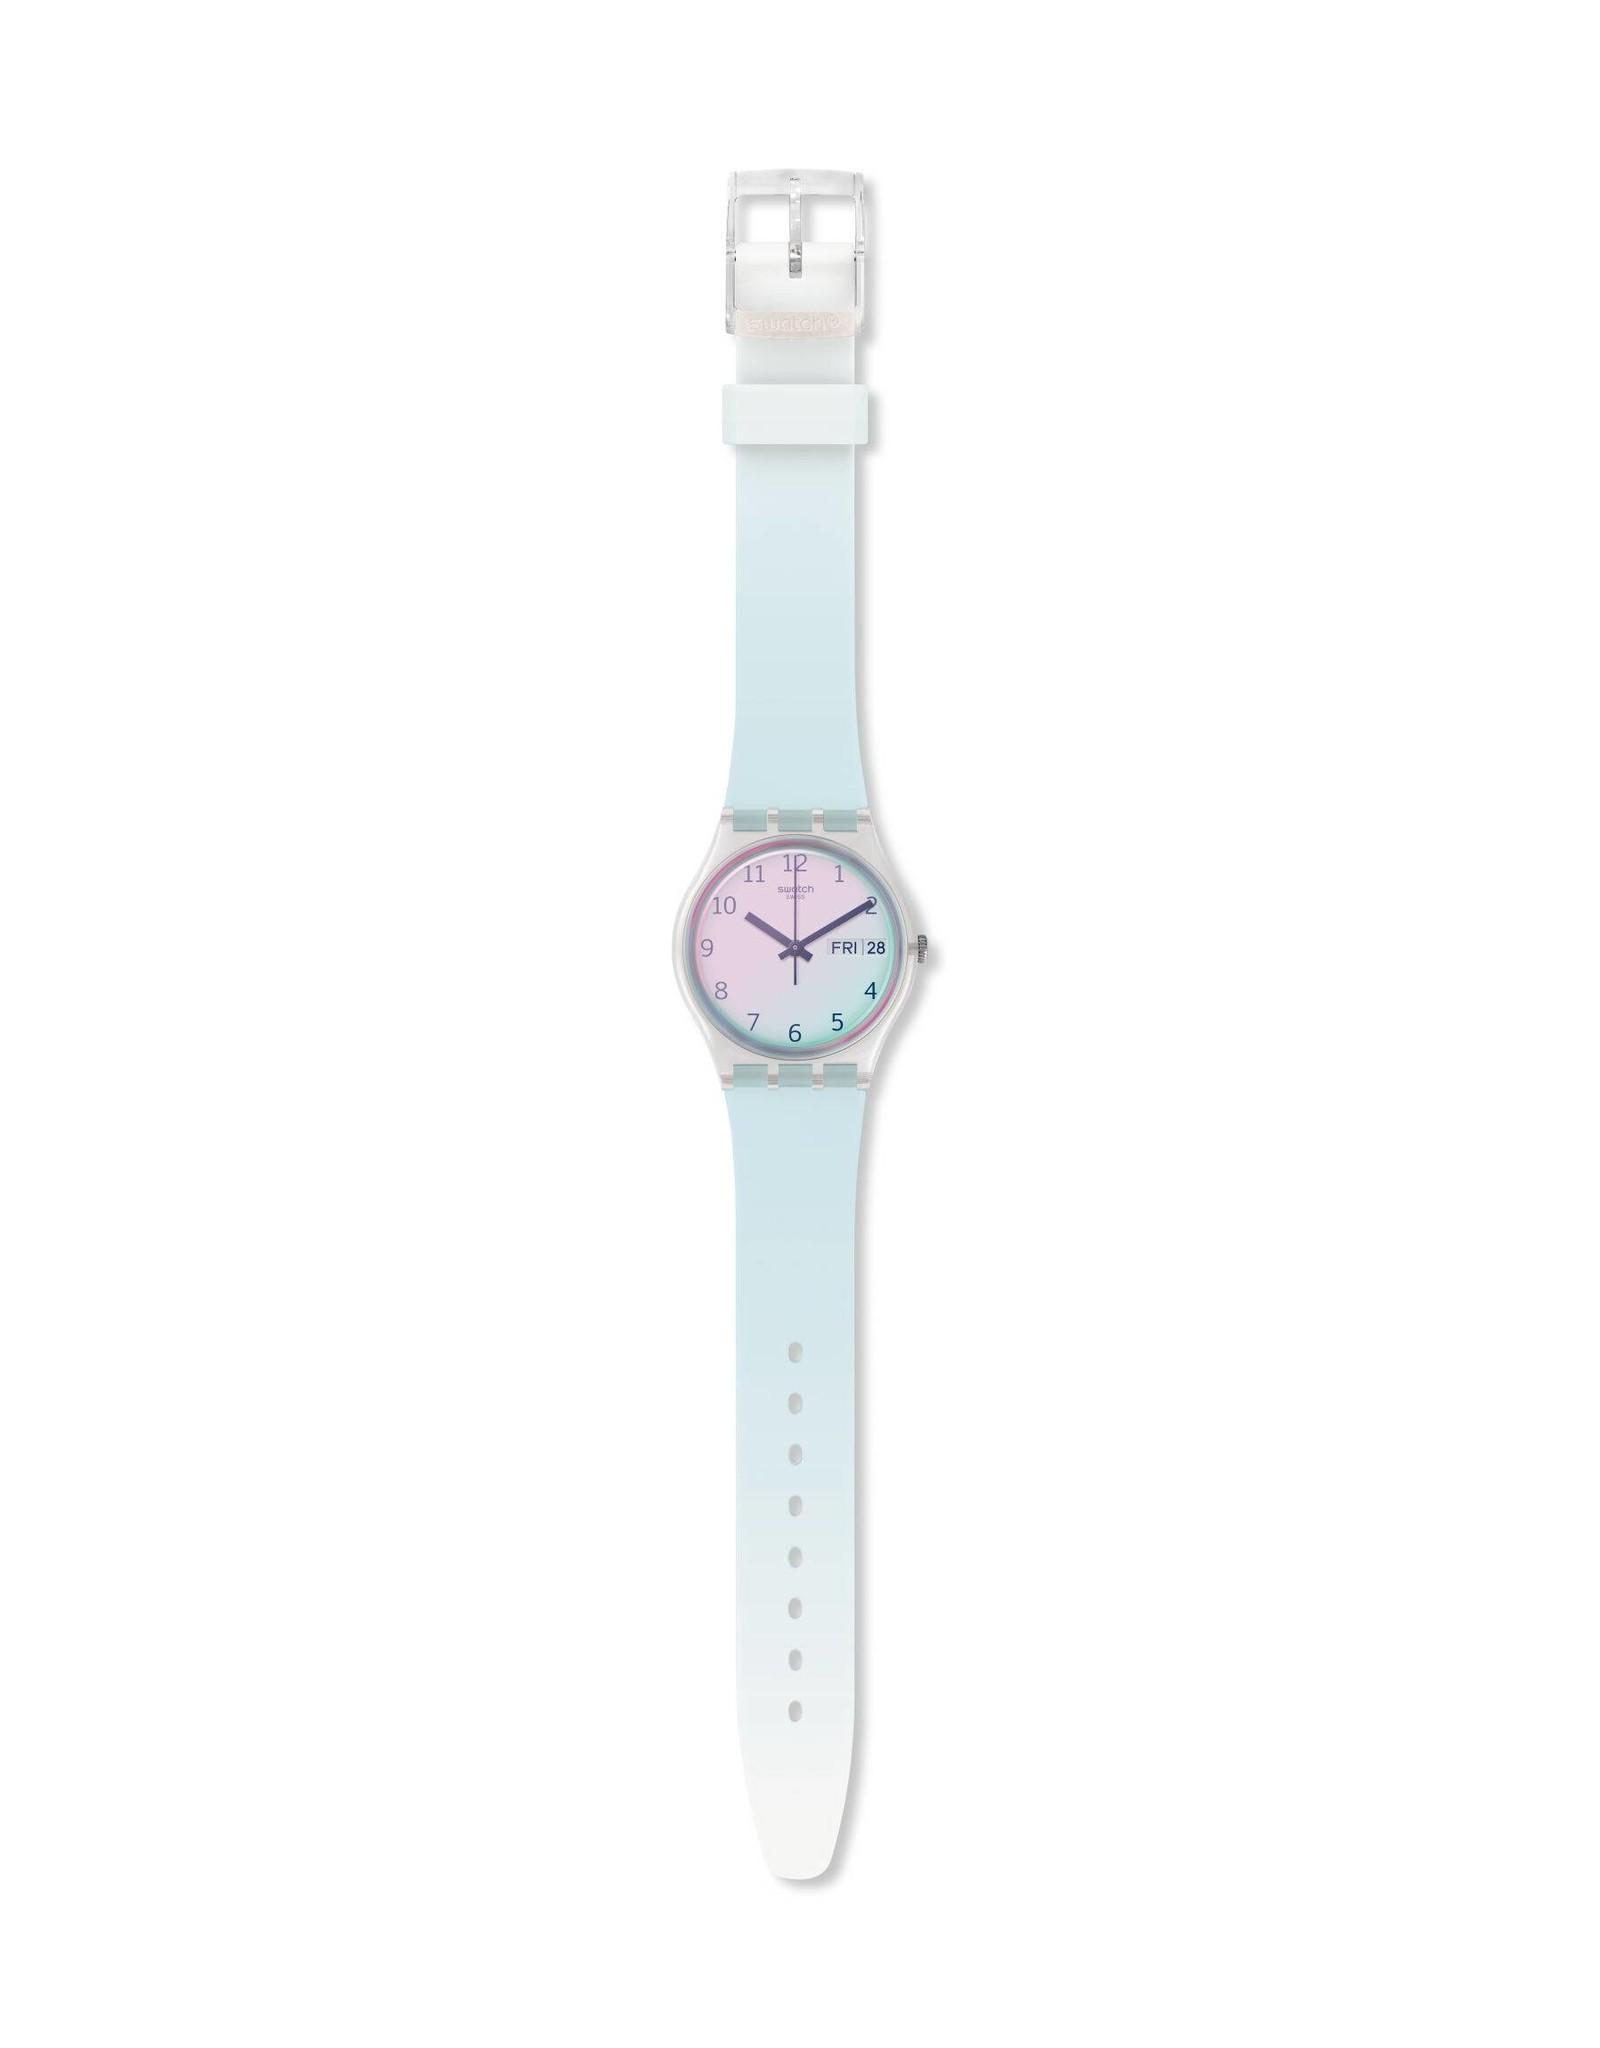 Swatch Swatch GE713 ULTRACIEL